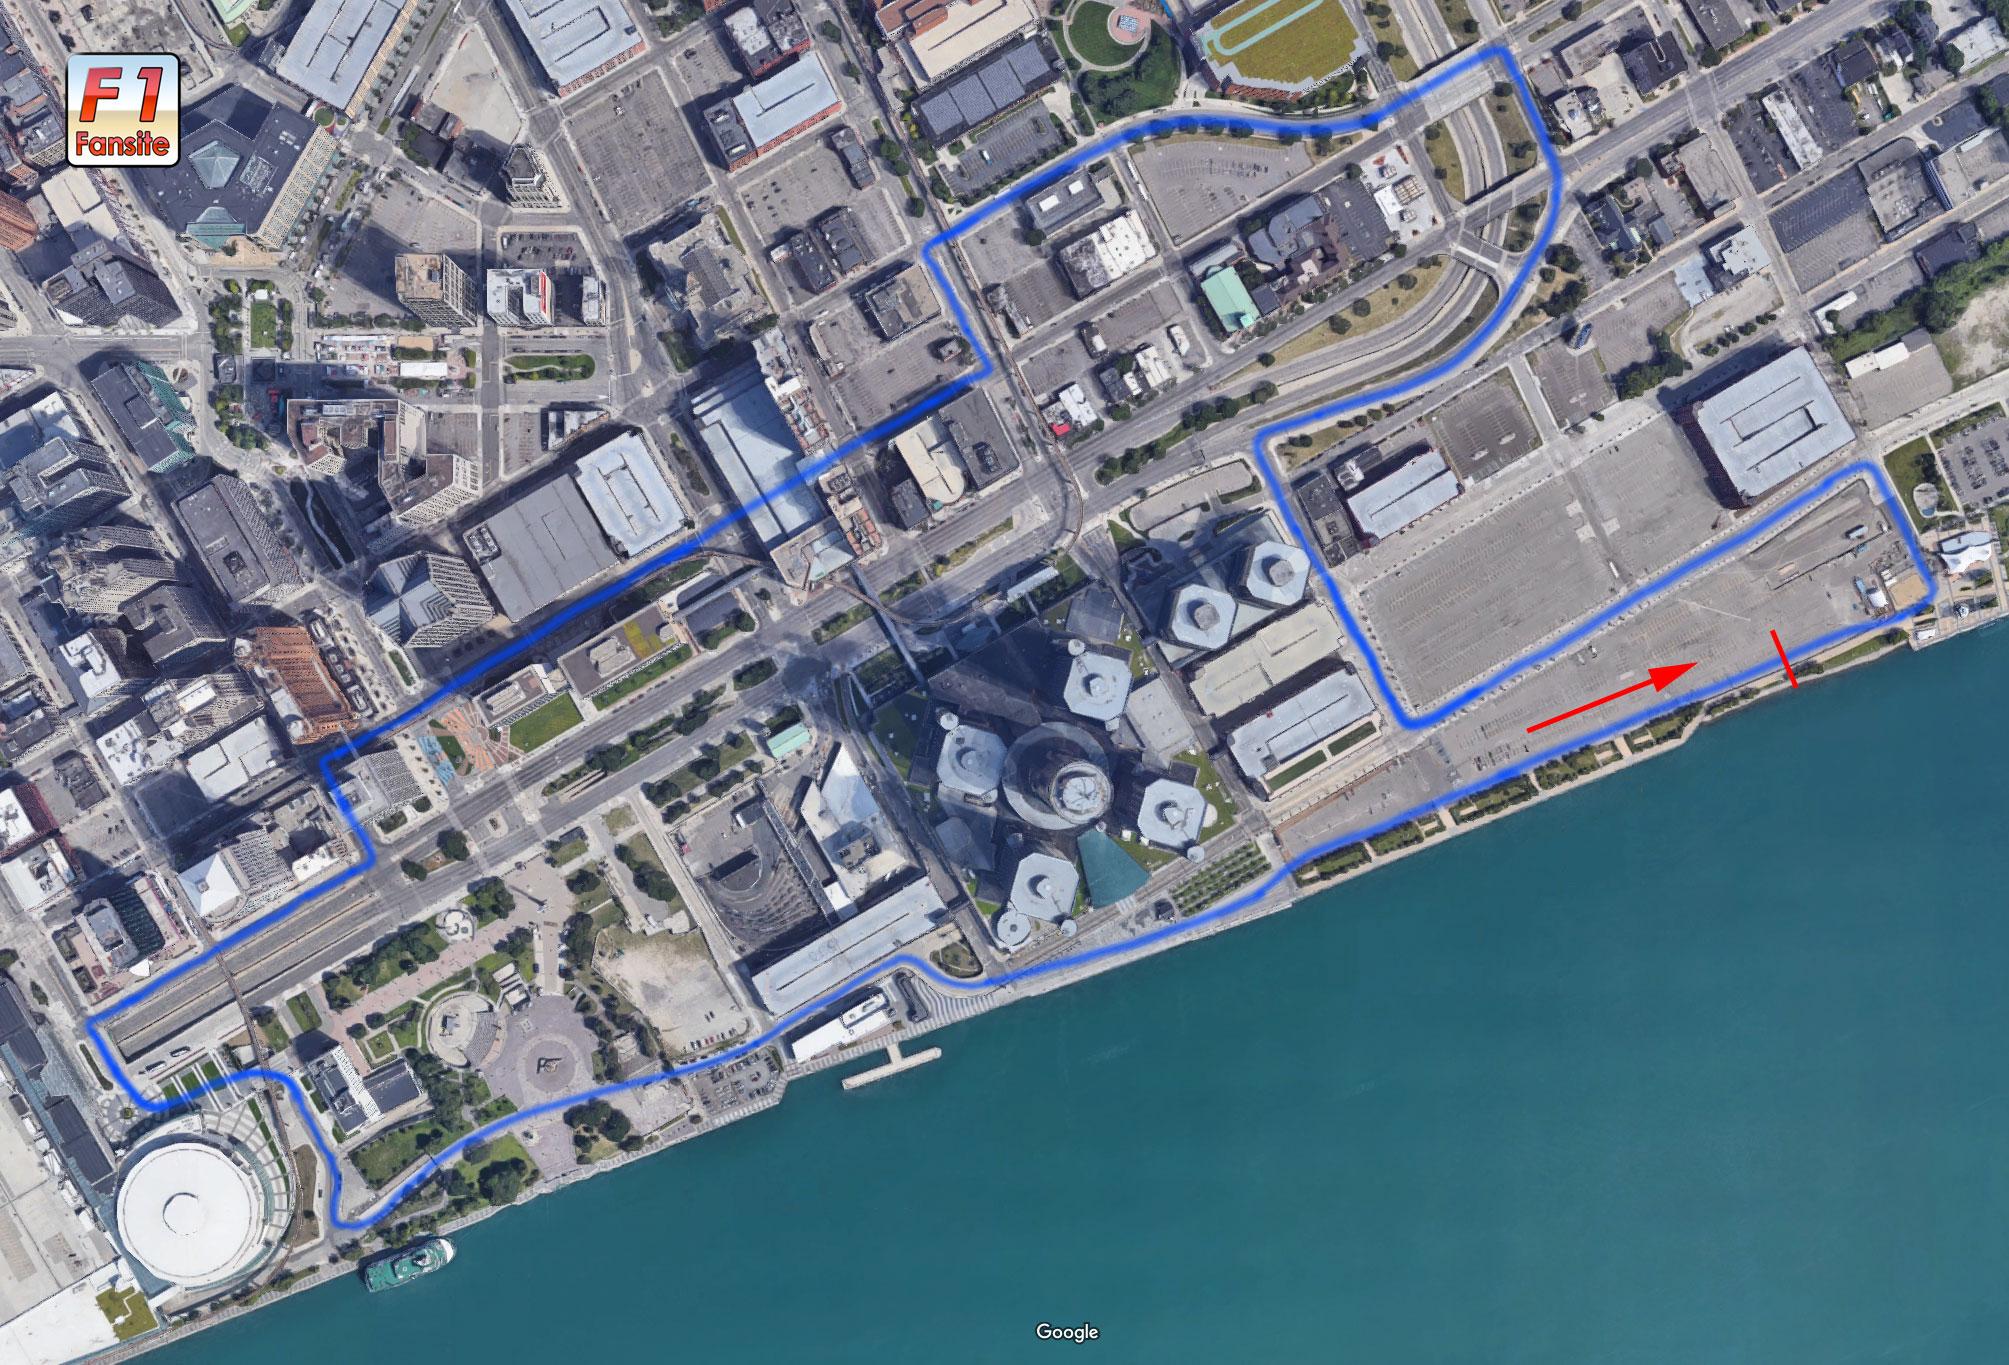 Detroit F1 Street circuit layout